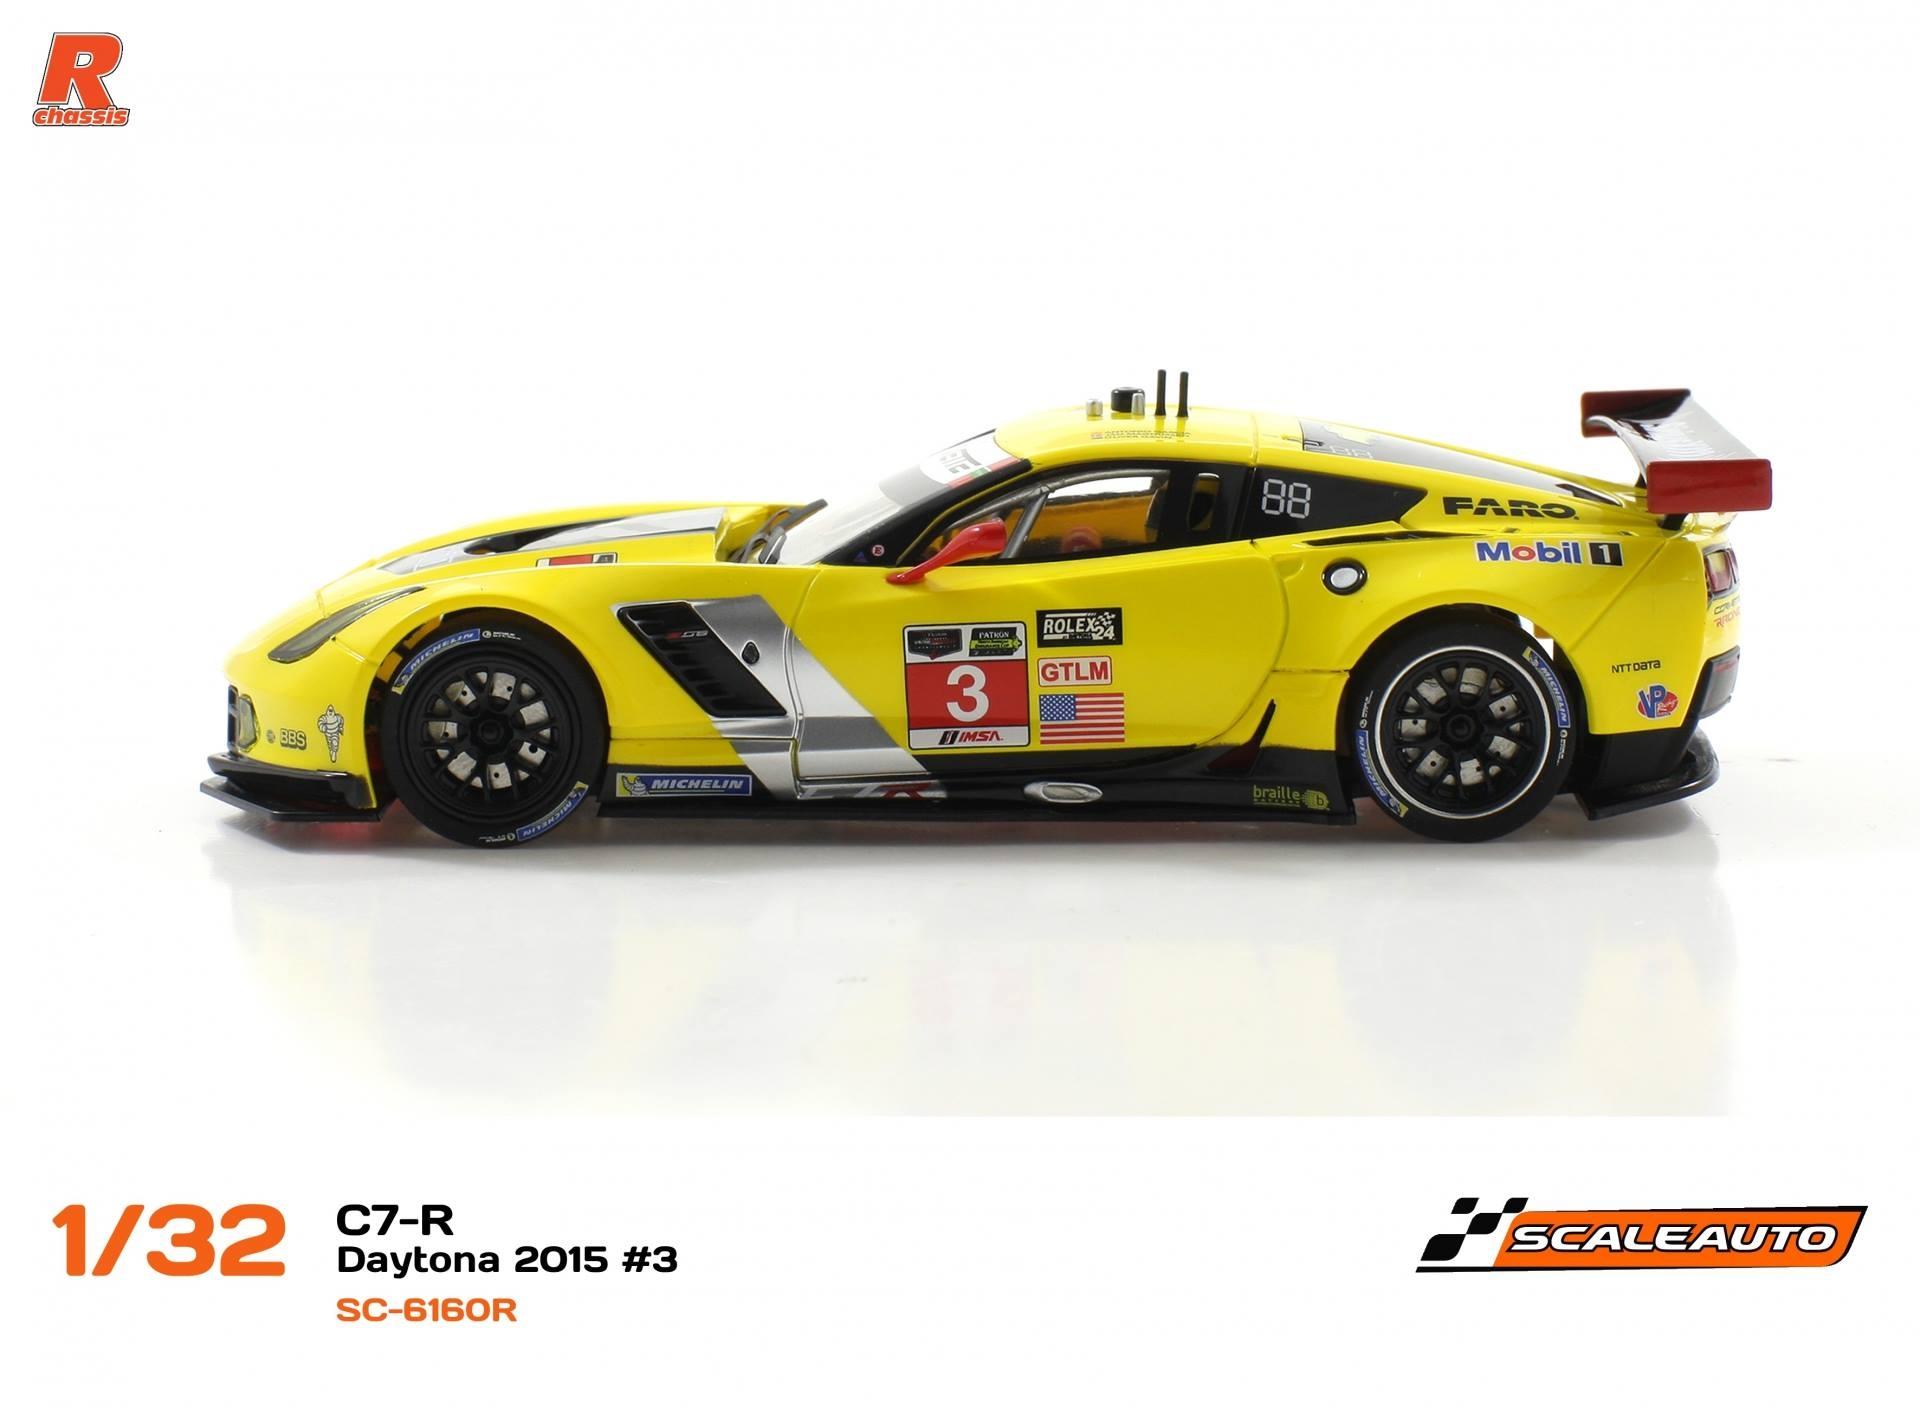 Scaleauto Corvette C7r Gt3 des 24 h. Daytona 2015 #3